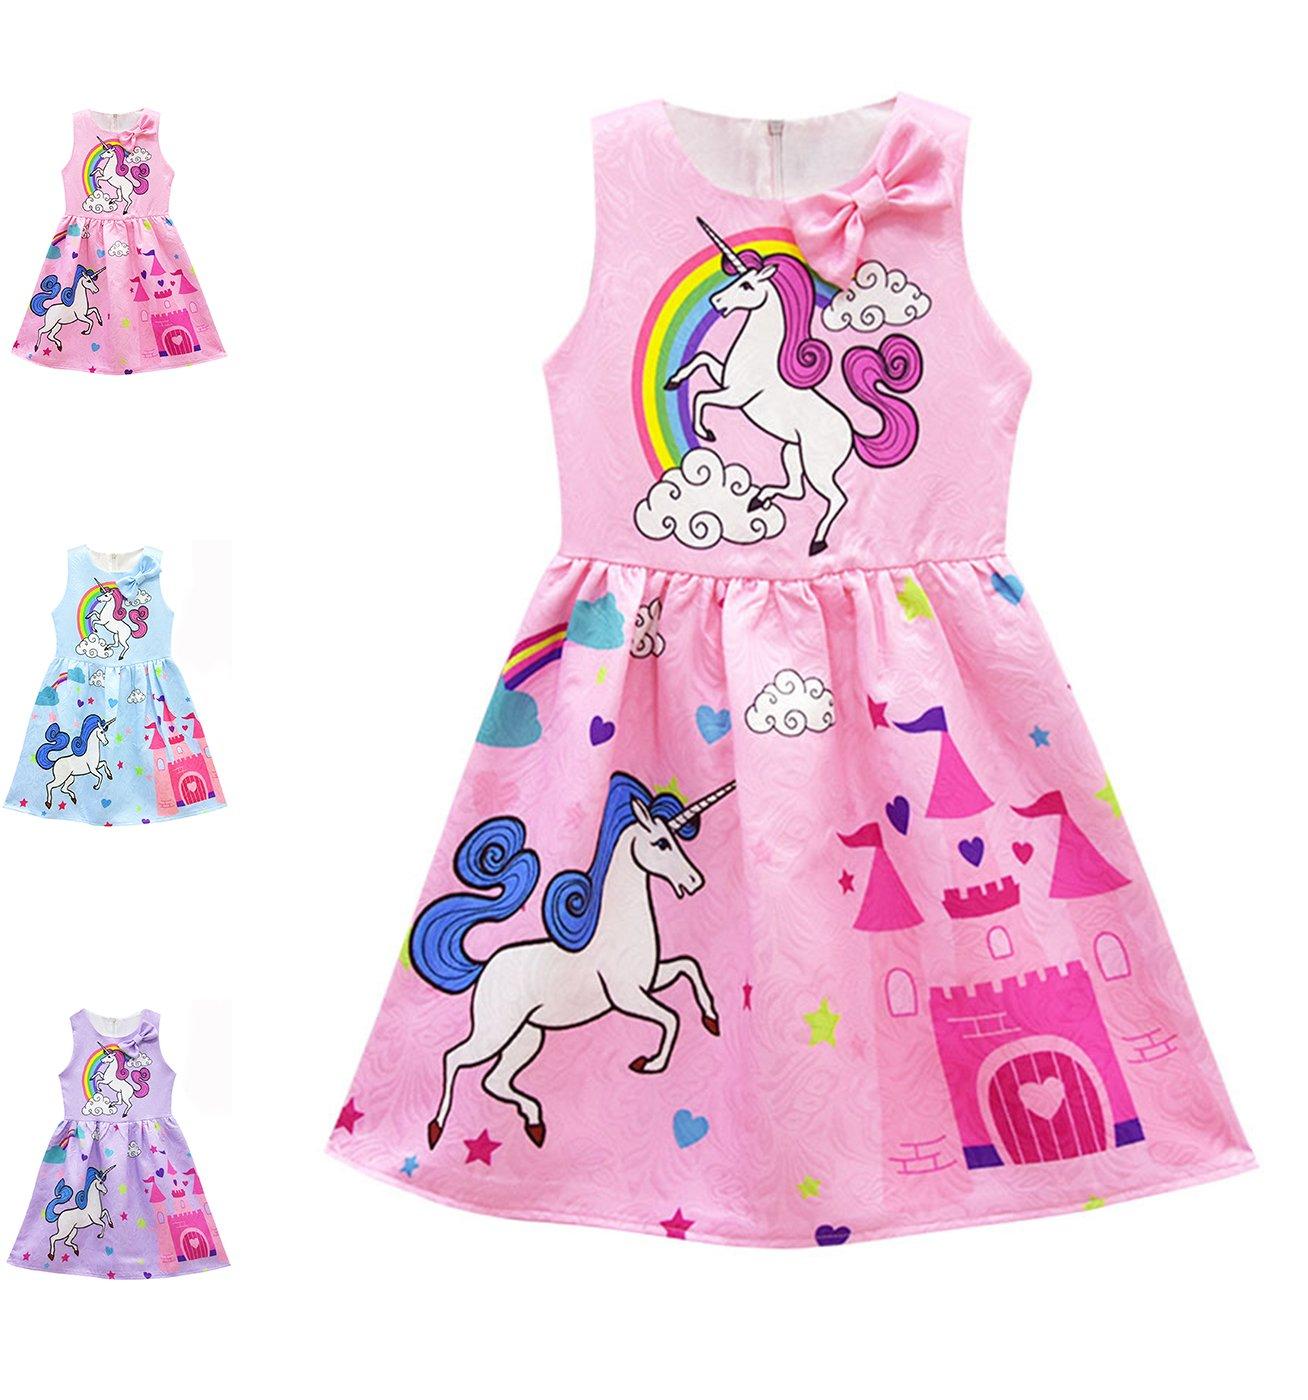 Girls Unicorn Dress, Summer Sleeveless Rainbow Dresses, Printed Party Fairy Dress Pleated Skirt (Pink, 120CM)